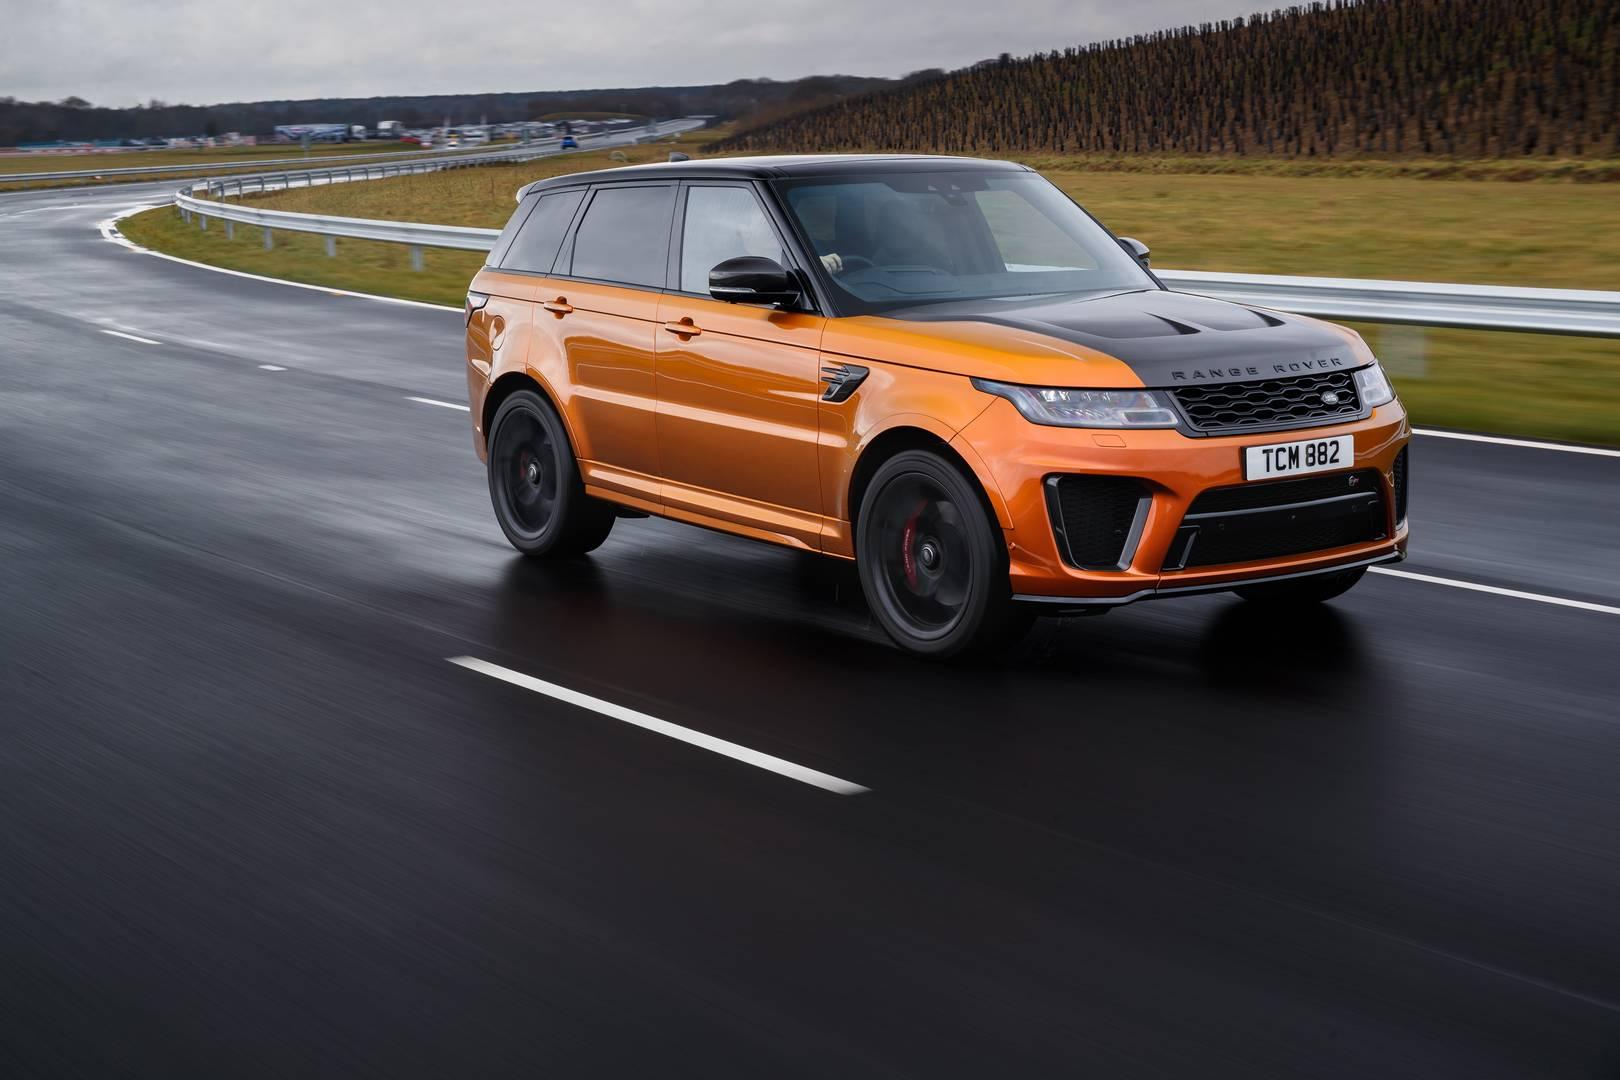 https://storage.googleapis.com/gtspirit/uploads/2018/03/Range-Rover-Sport-SVR-Madagascar-Orange-10.jpg